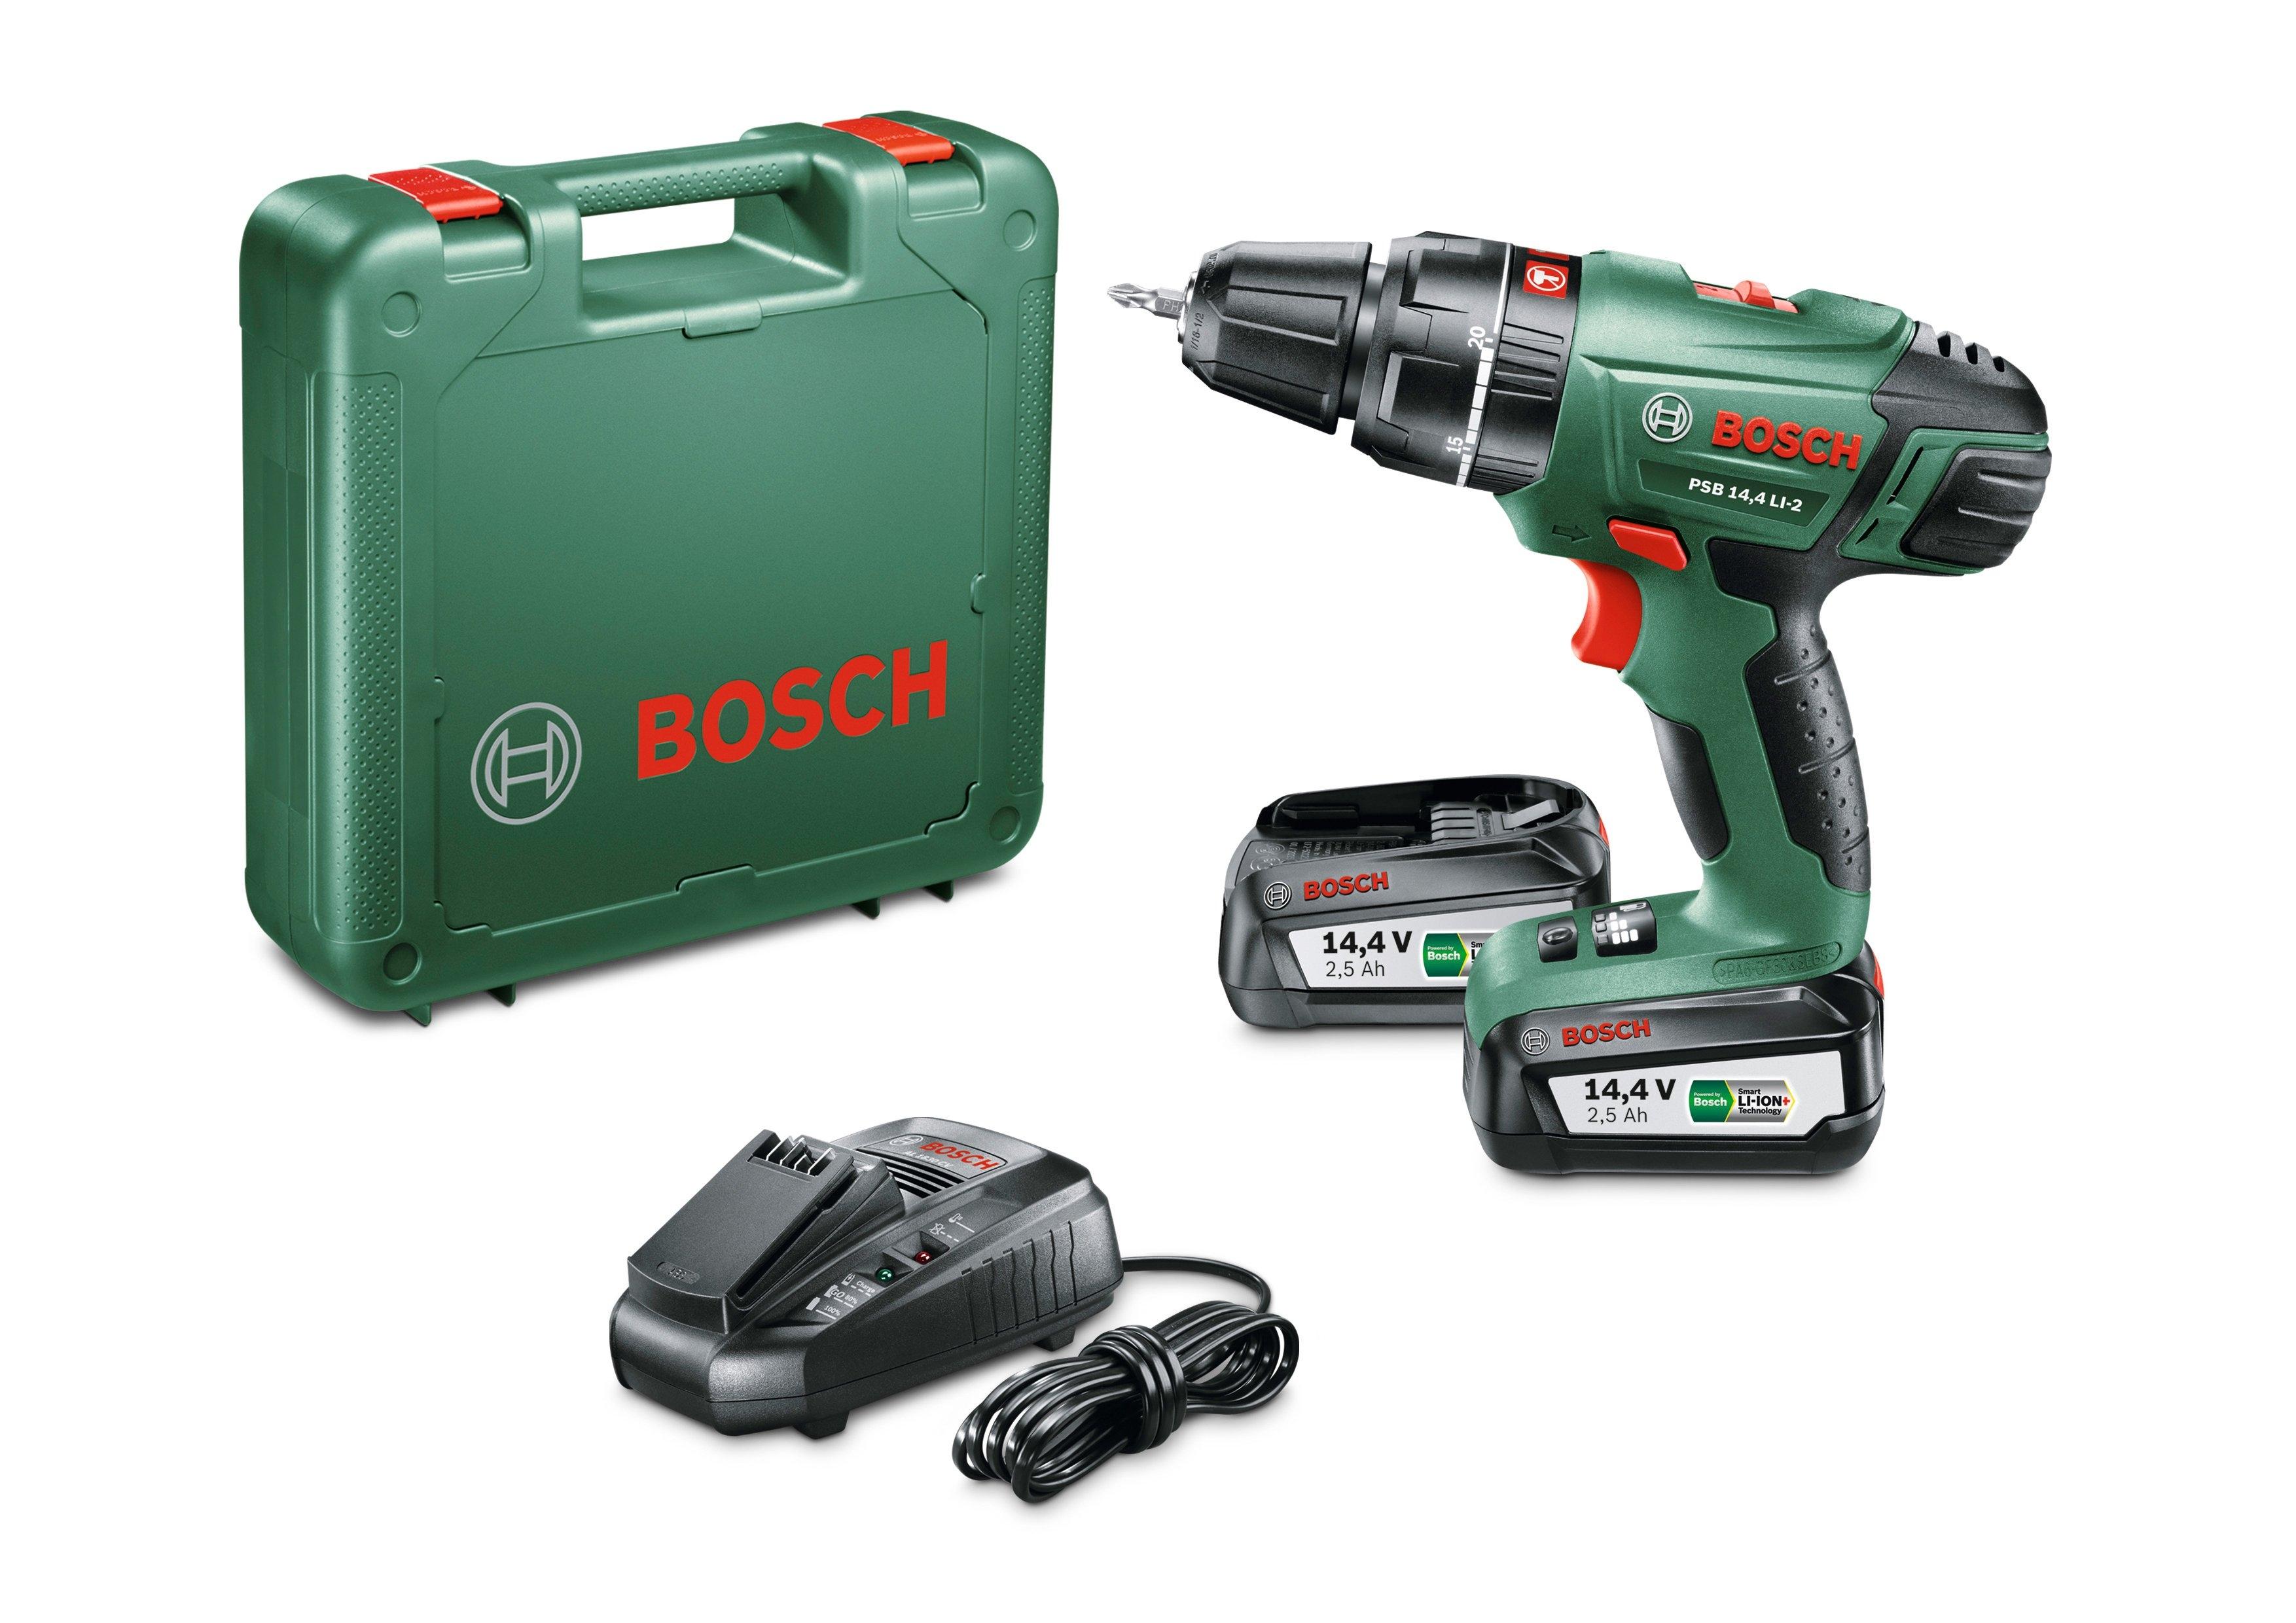 Bosch Accuklopboormachine »PSB 14,4 LI-2«, 2 Akkus, 14,4 V, oplaadapparaat & koffers - gratis ruilen op otto.nl